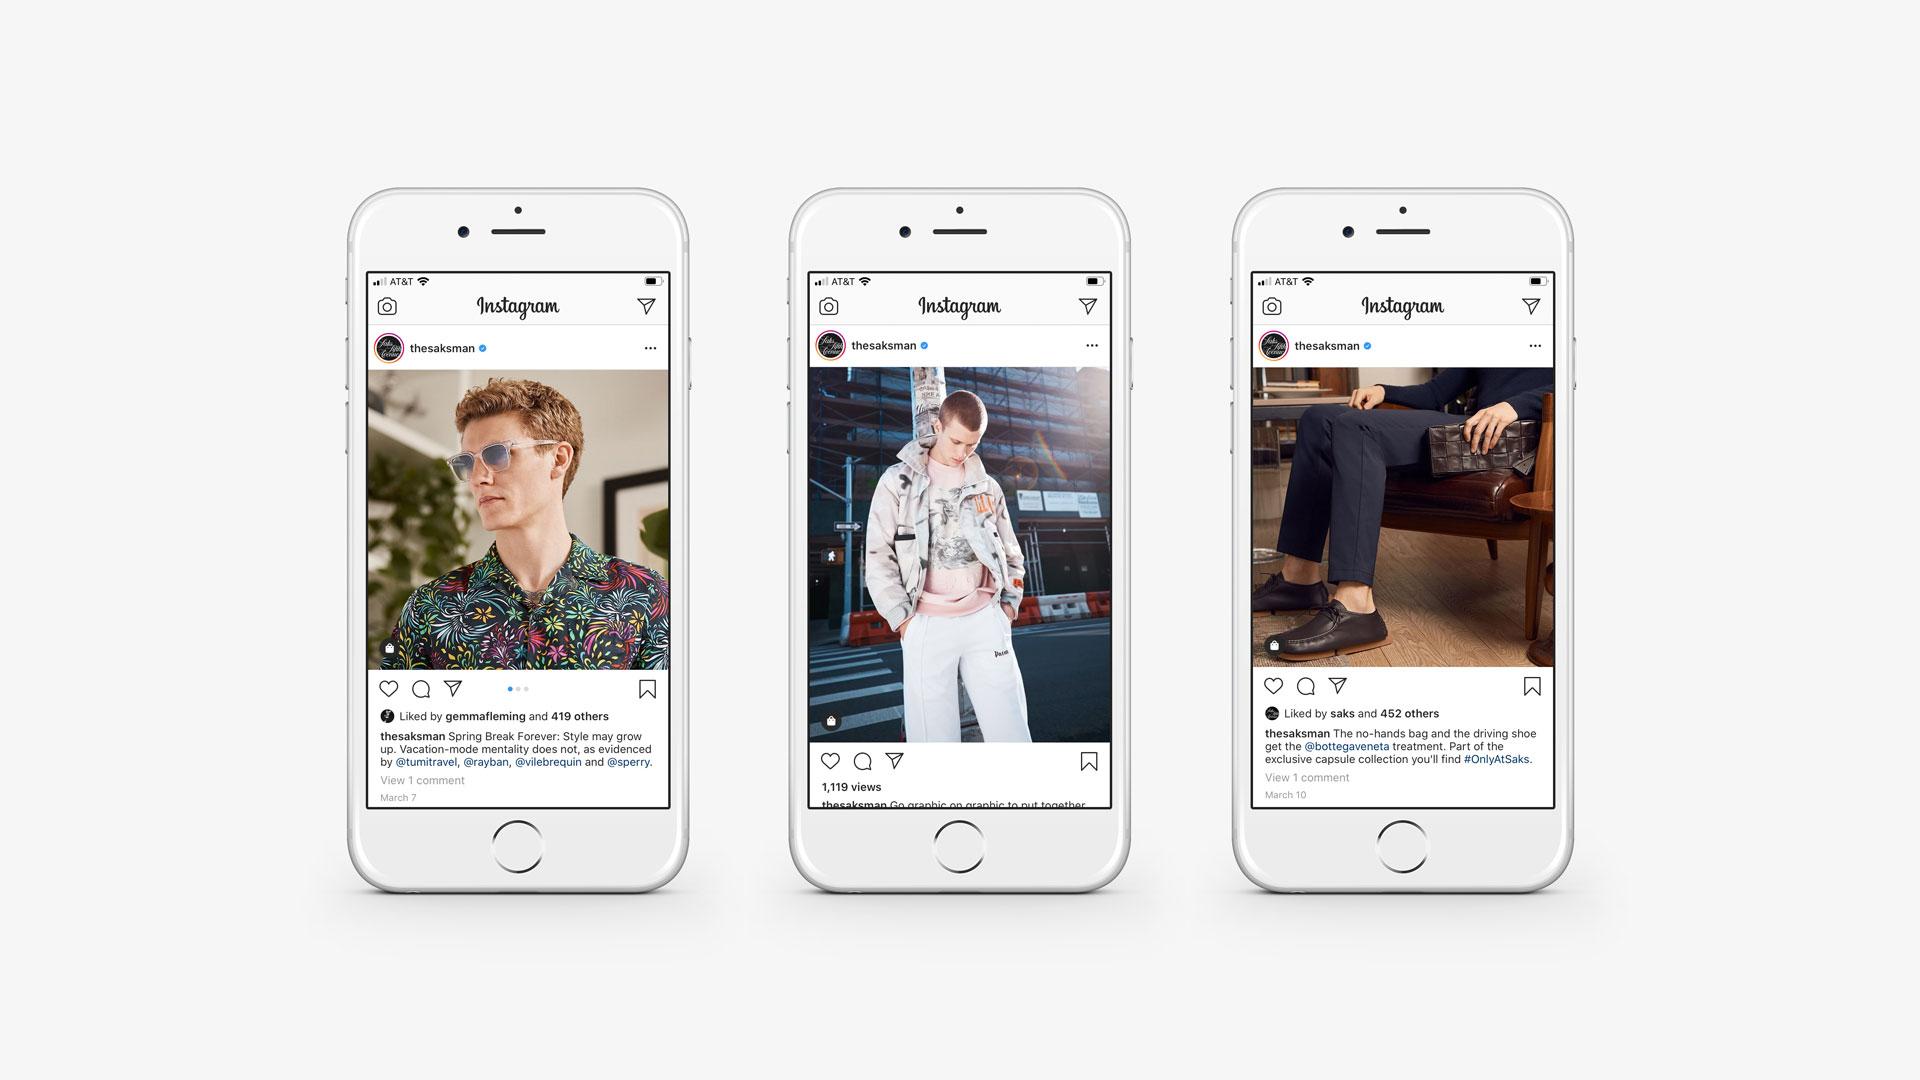 Saks Fifth Avenue Mens Instagram